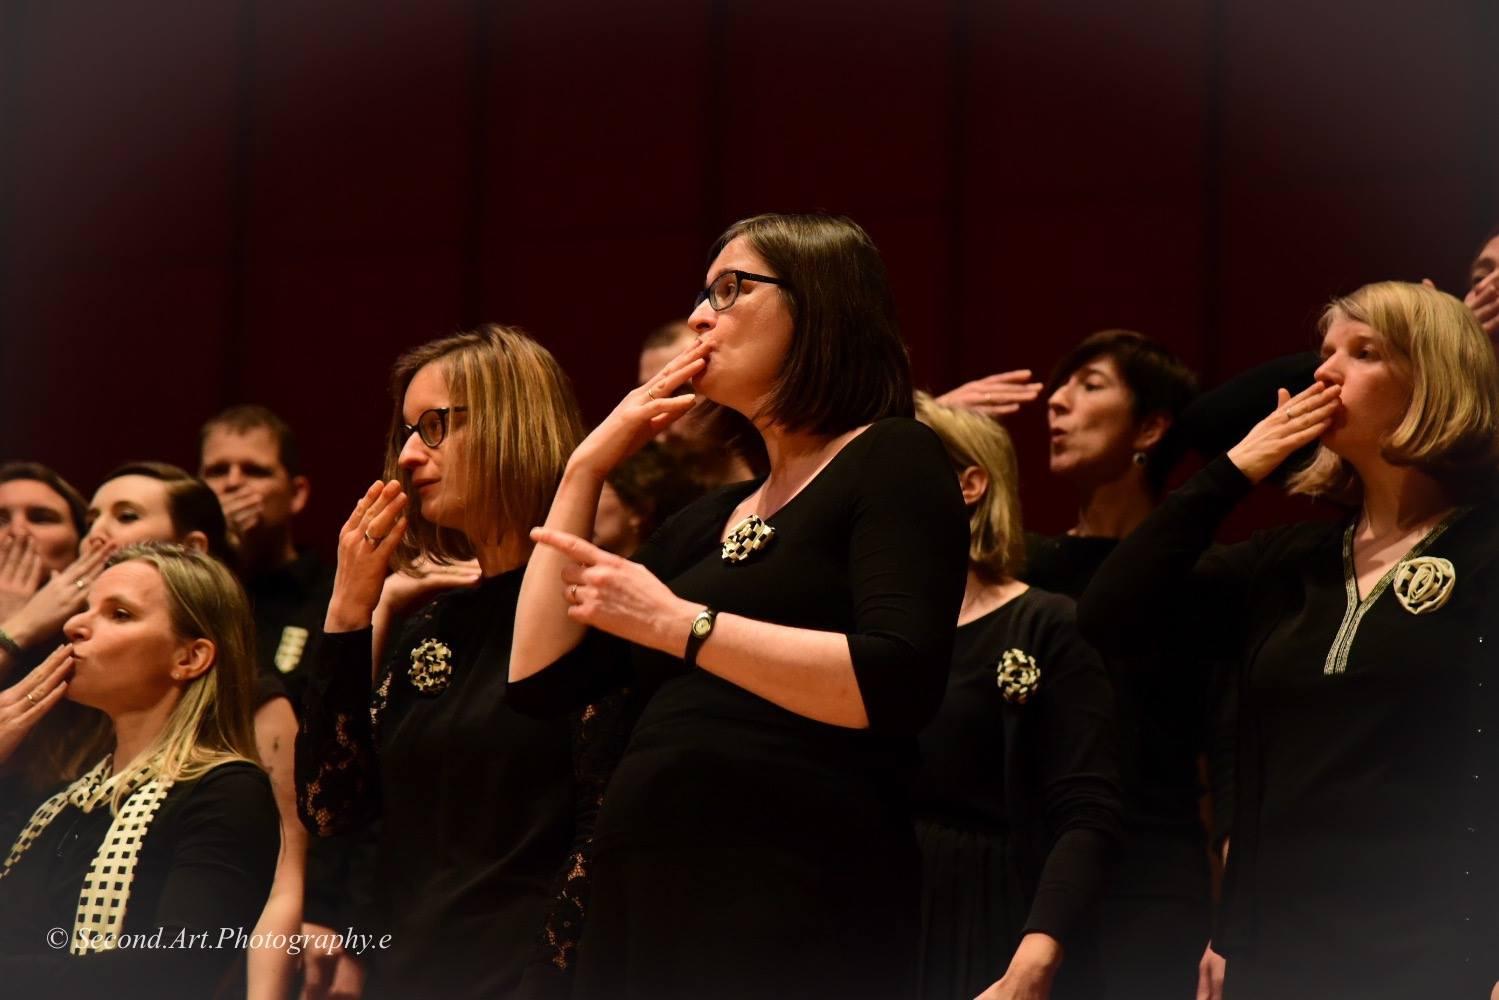 Concert Caljenté o.l.v. Tine Rabijns